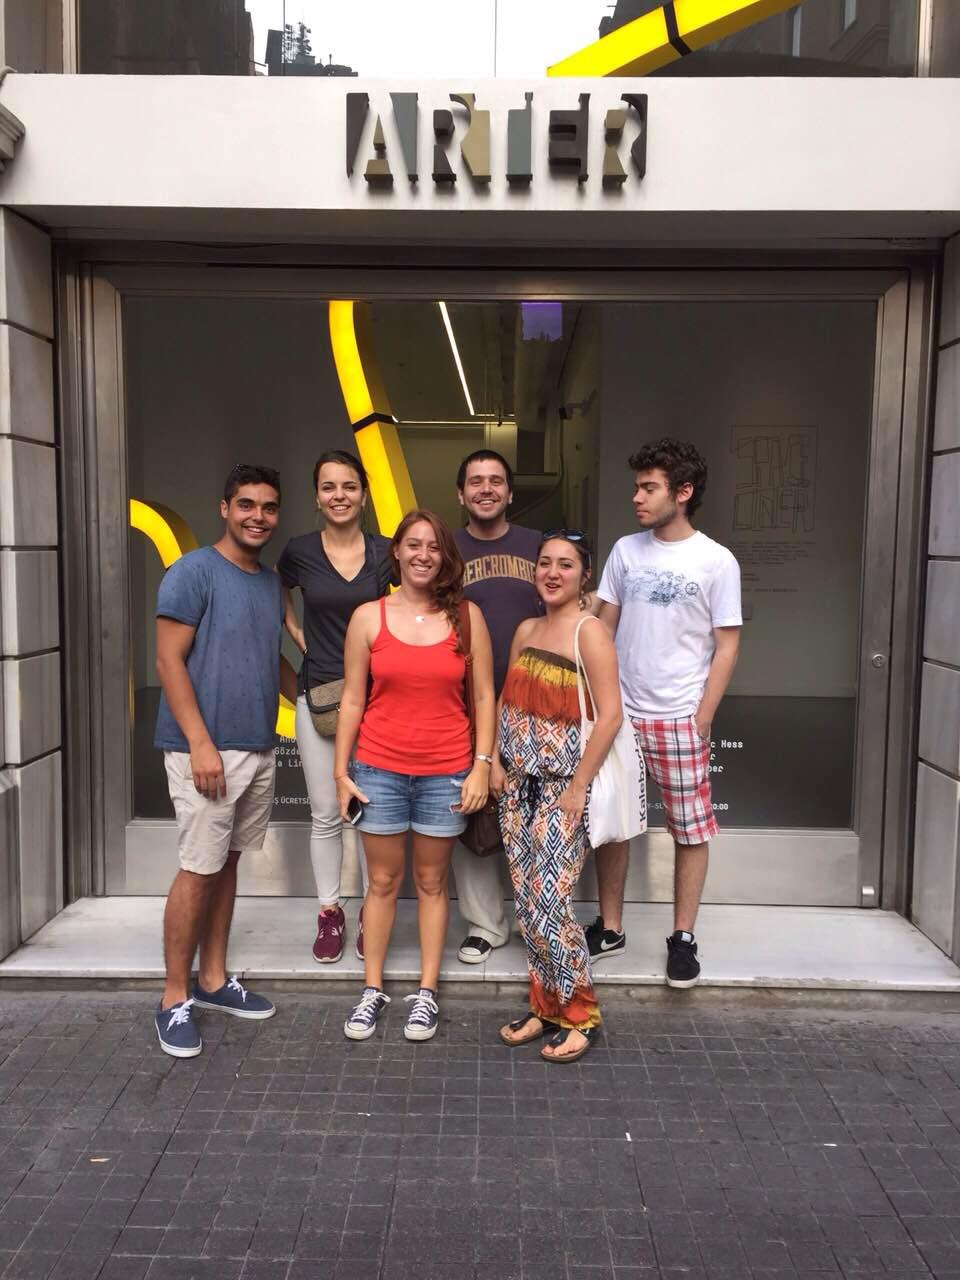 02.08.2015 / Arter Sanat Galerisi Gezisi